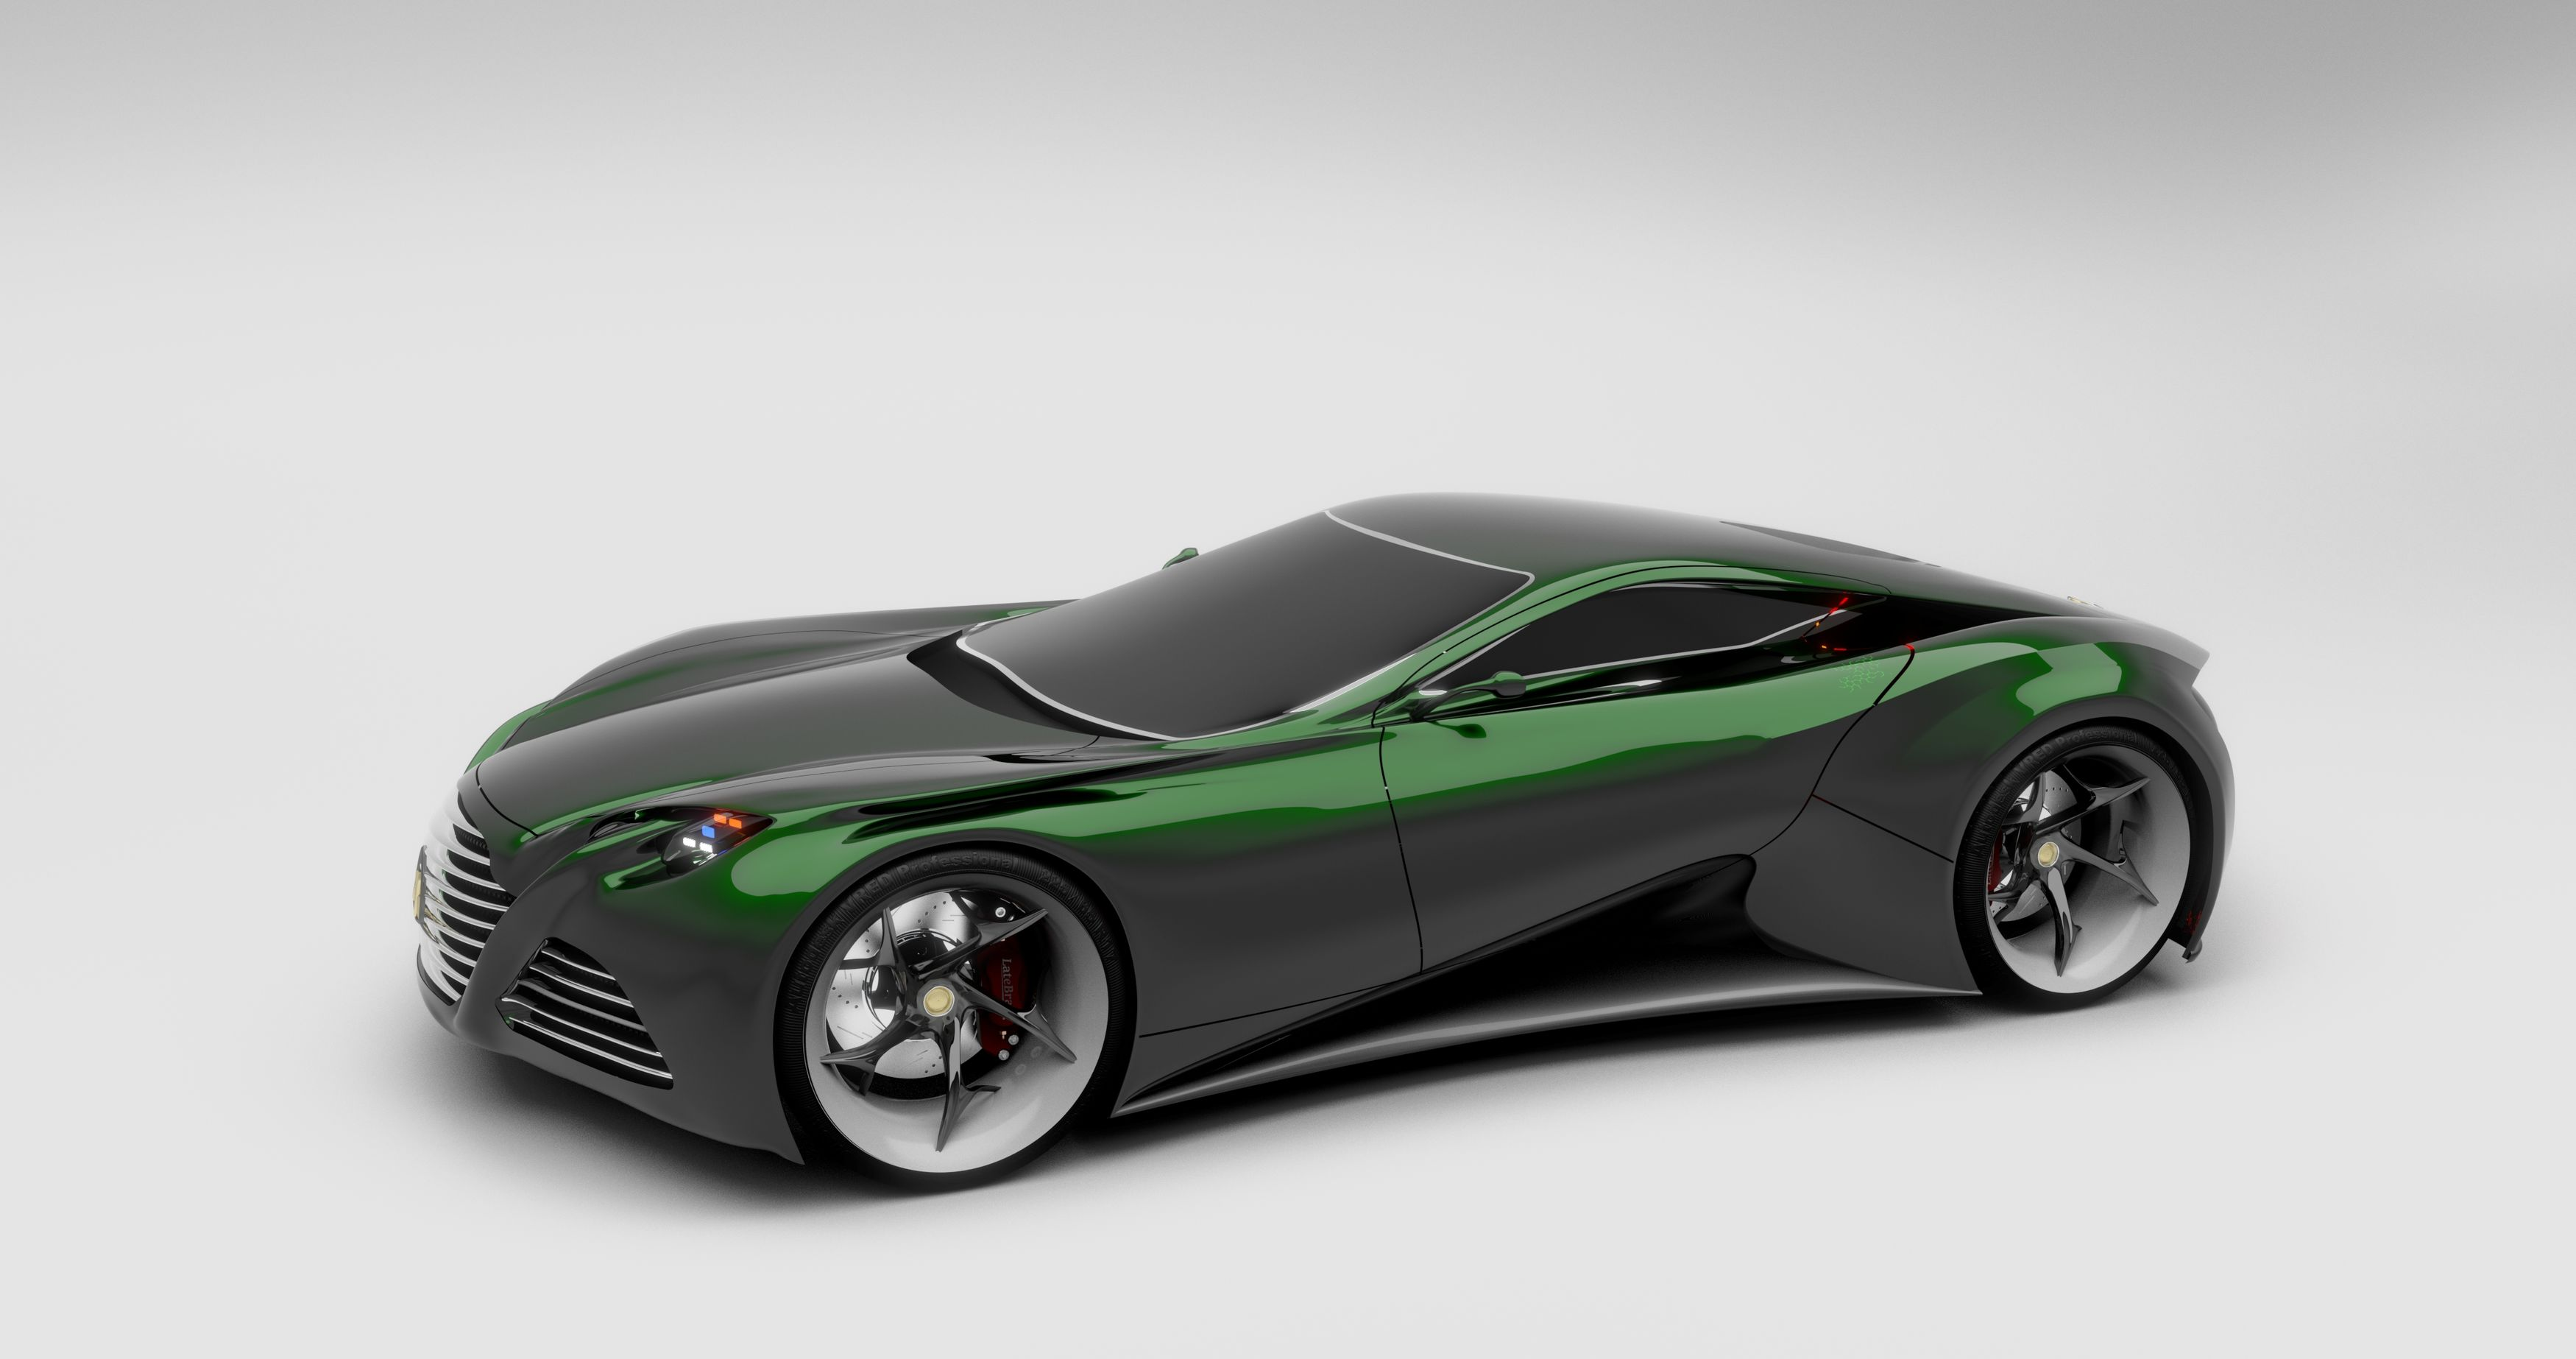 Aston-martin-db-next-x-2-3500-3500